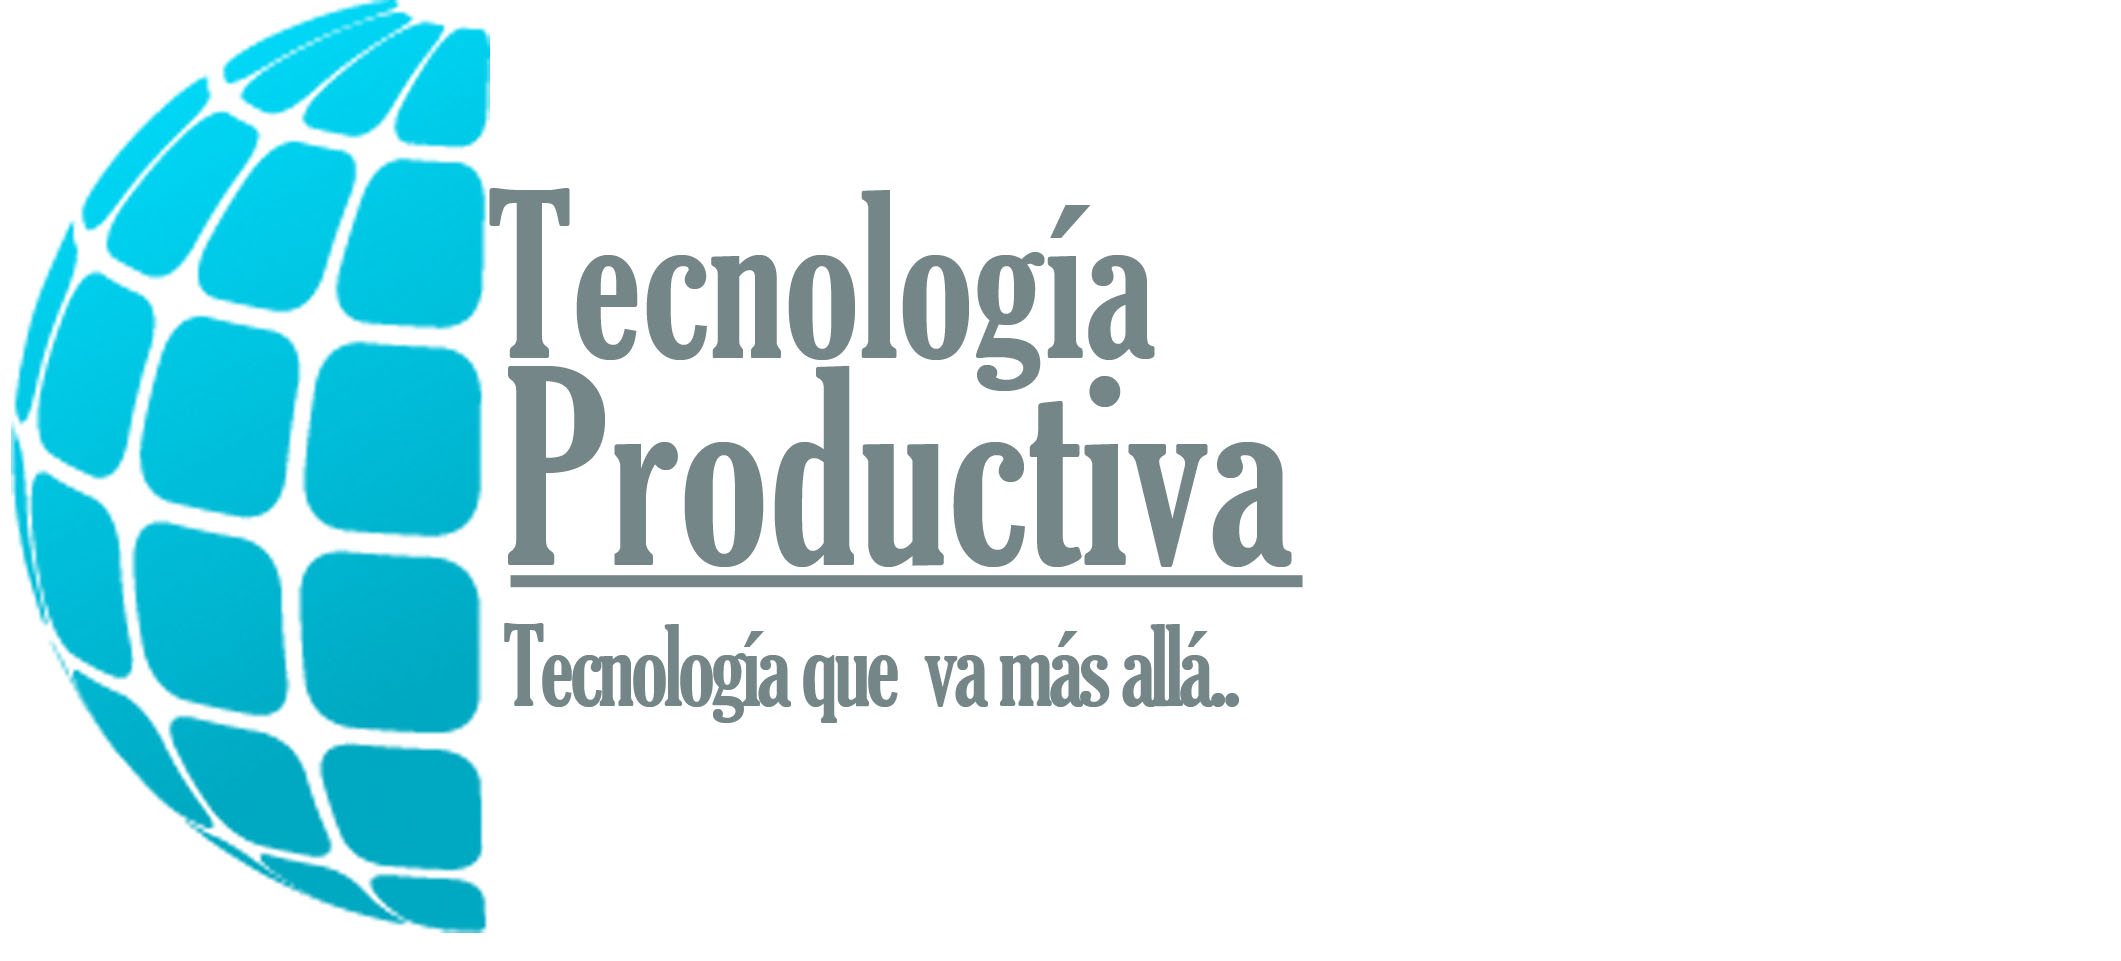 Tecnologia Productiva